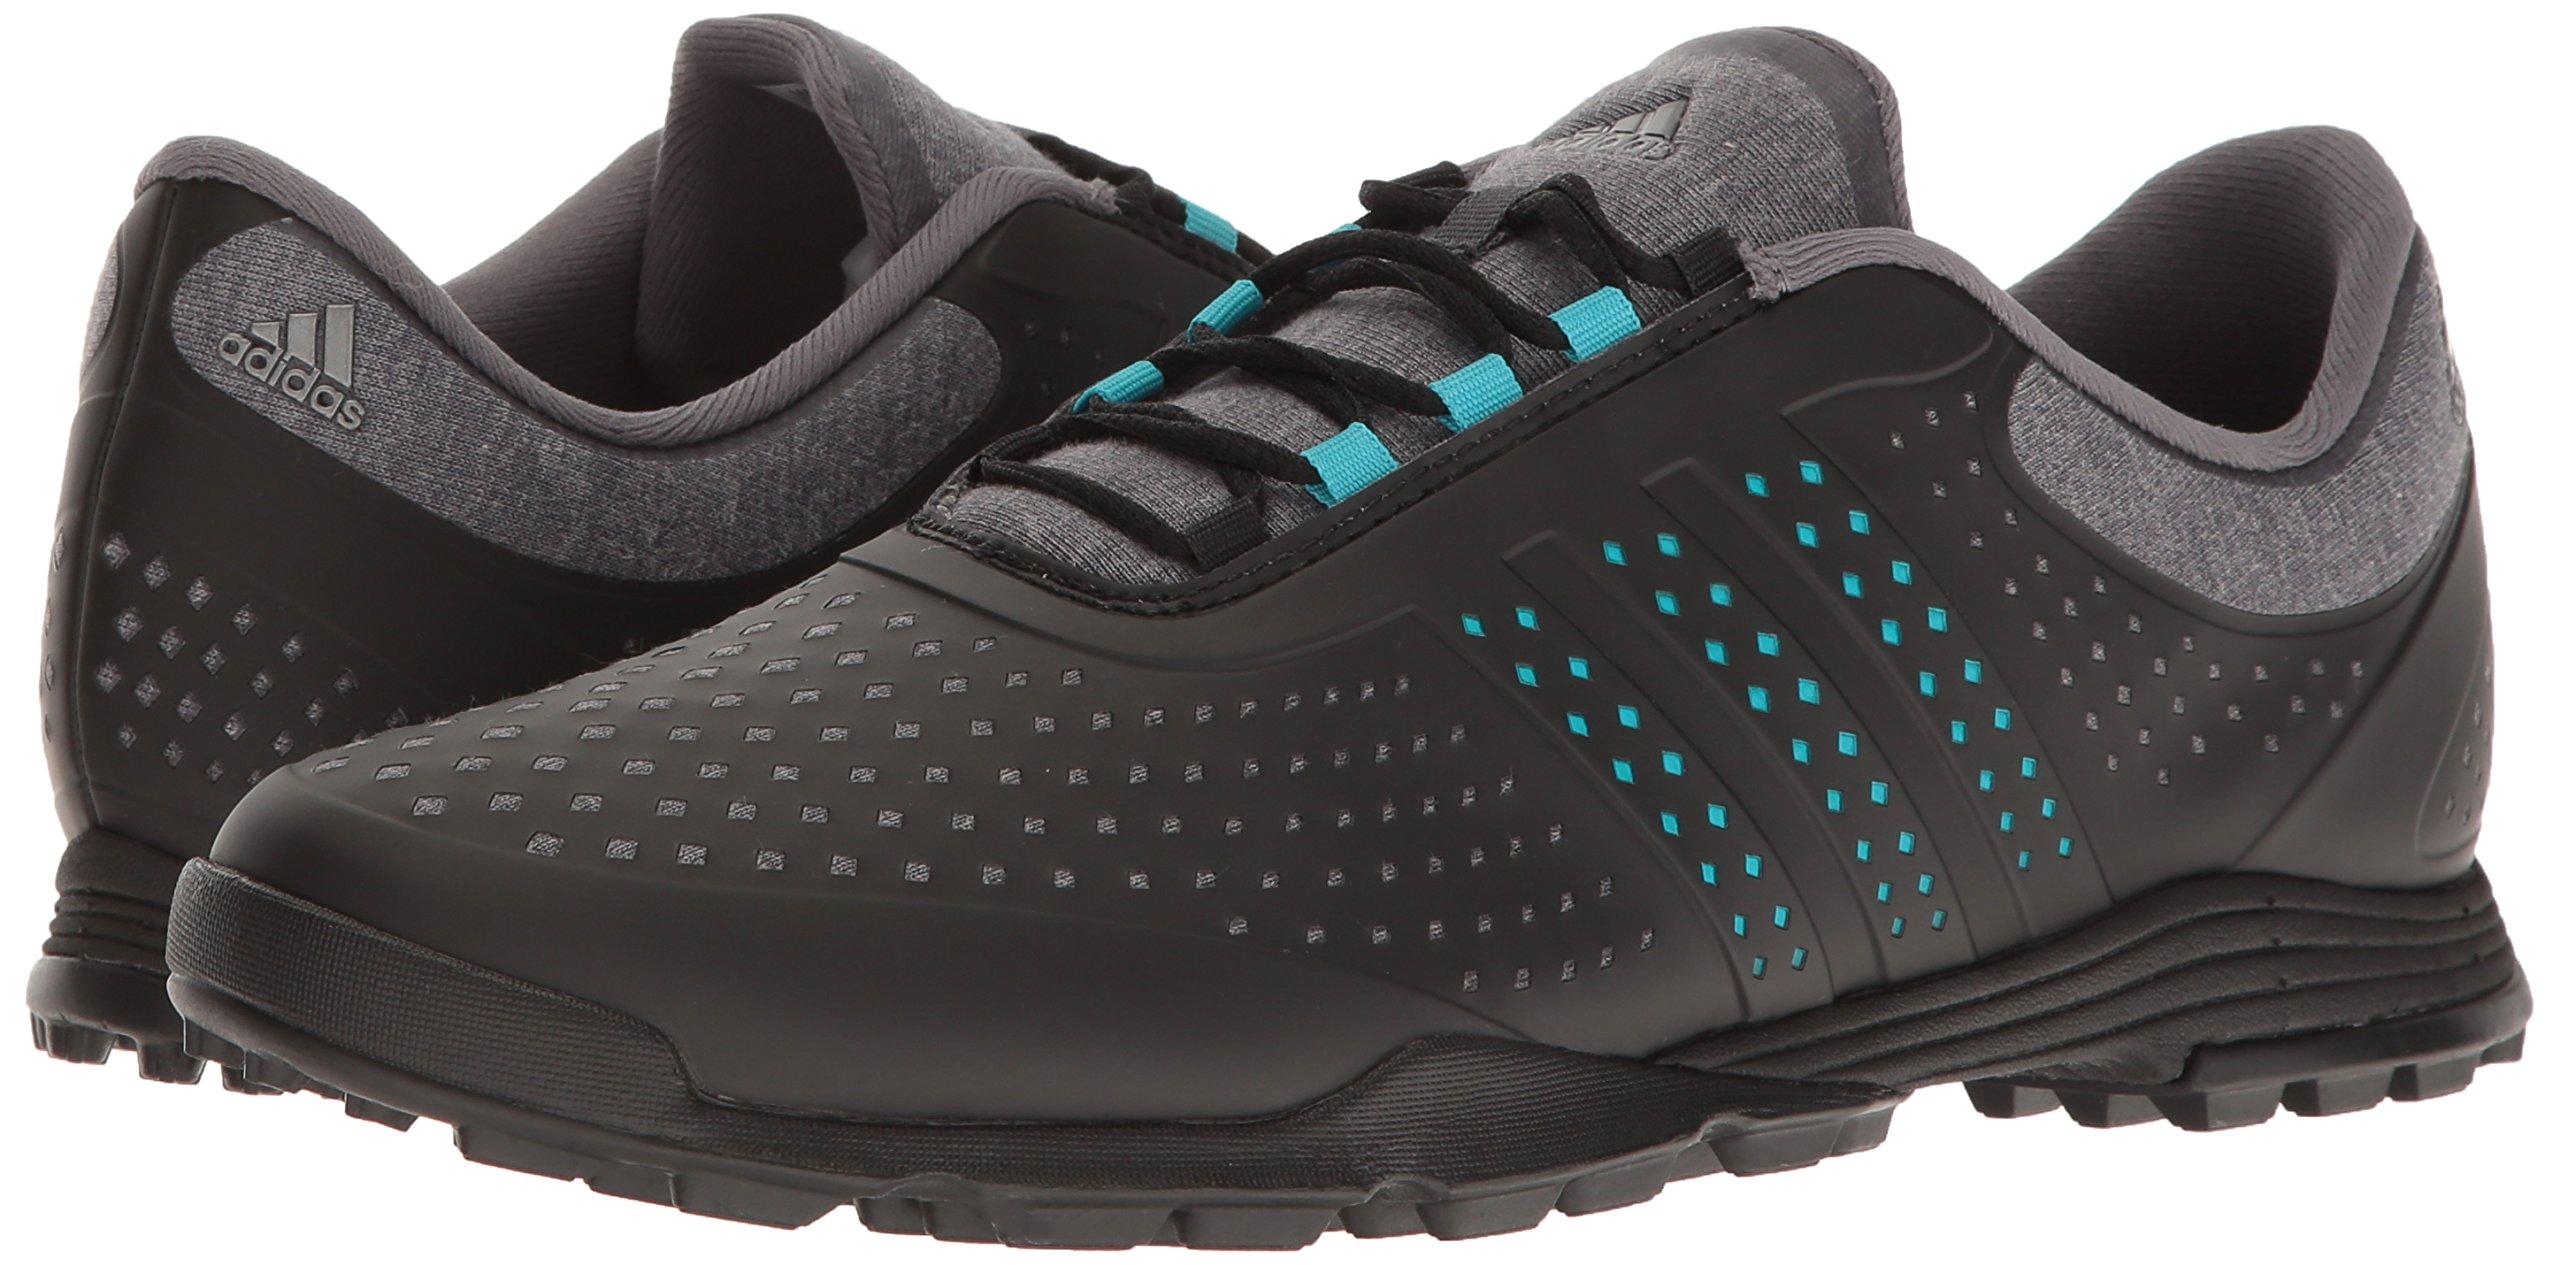 adidas Women's Adipure Sport Golf Shoe, Grey, 7 M US by adidas (Image #6)